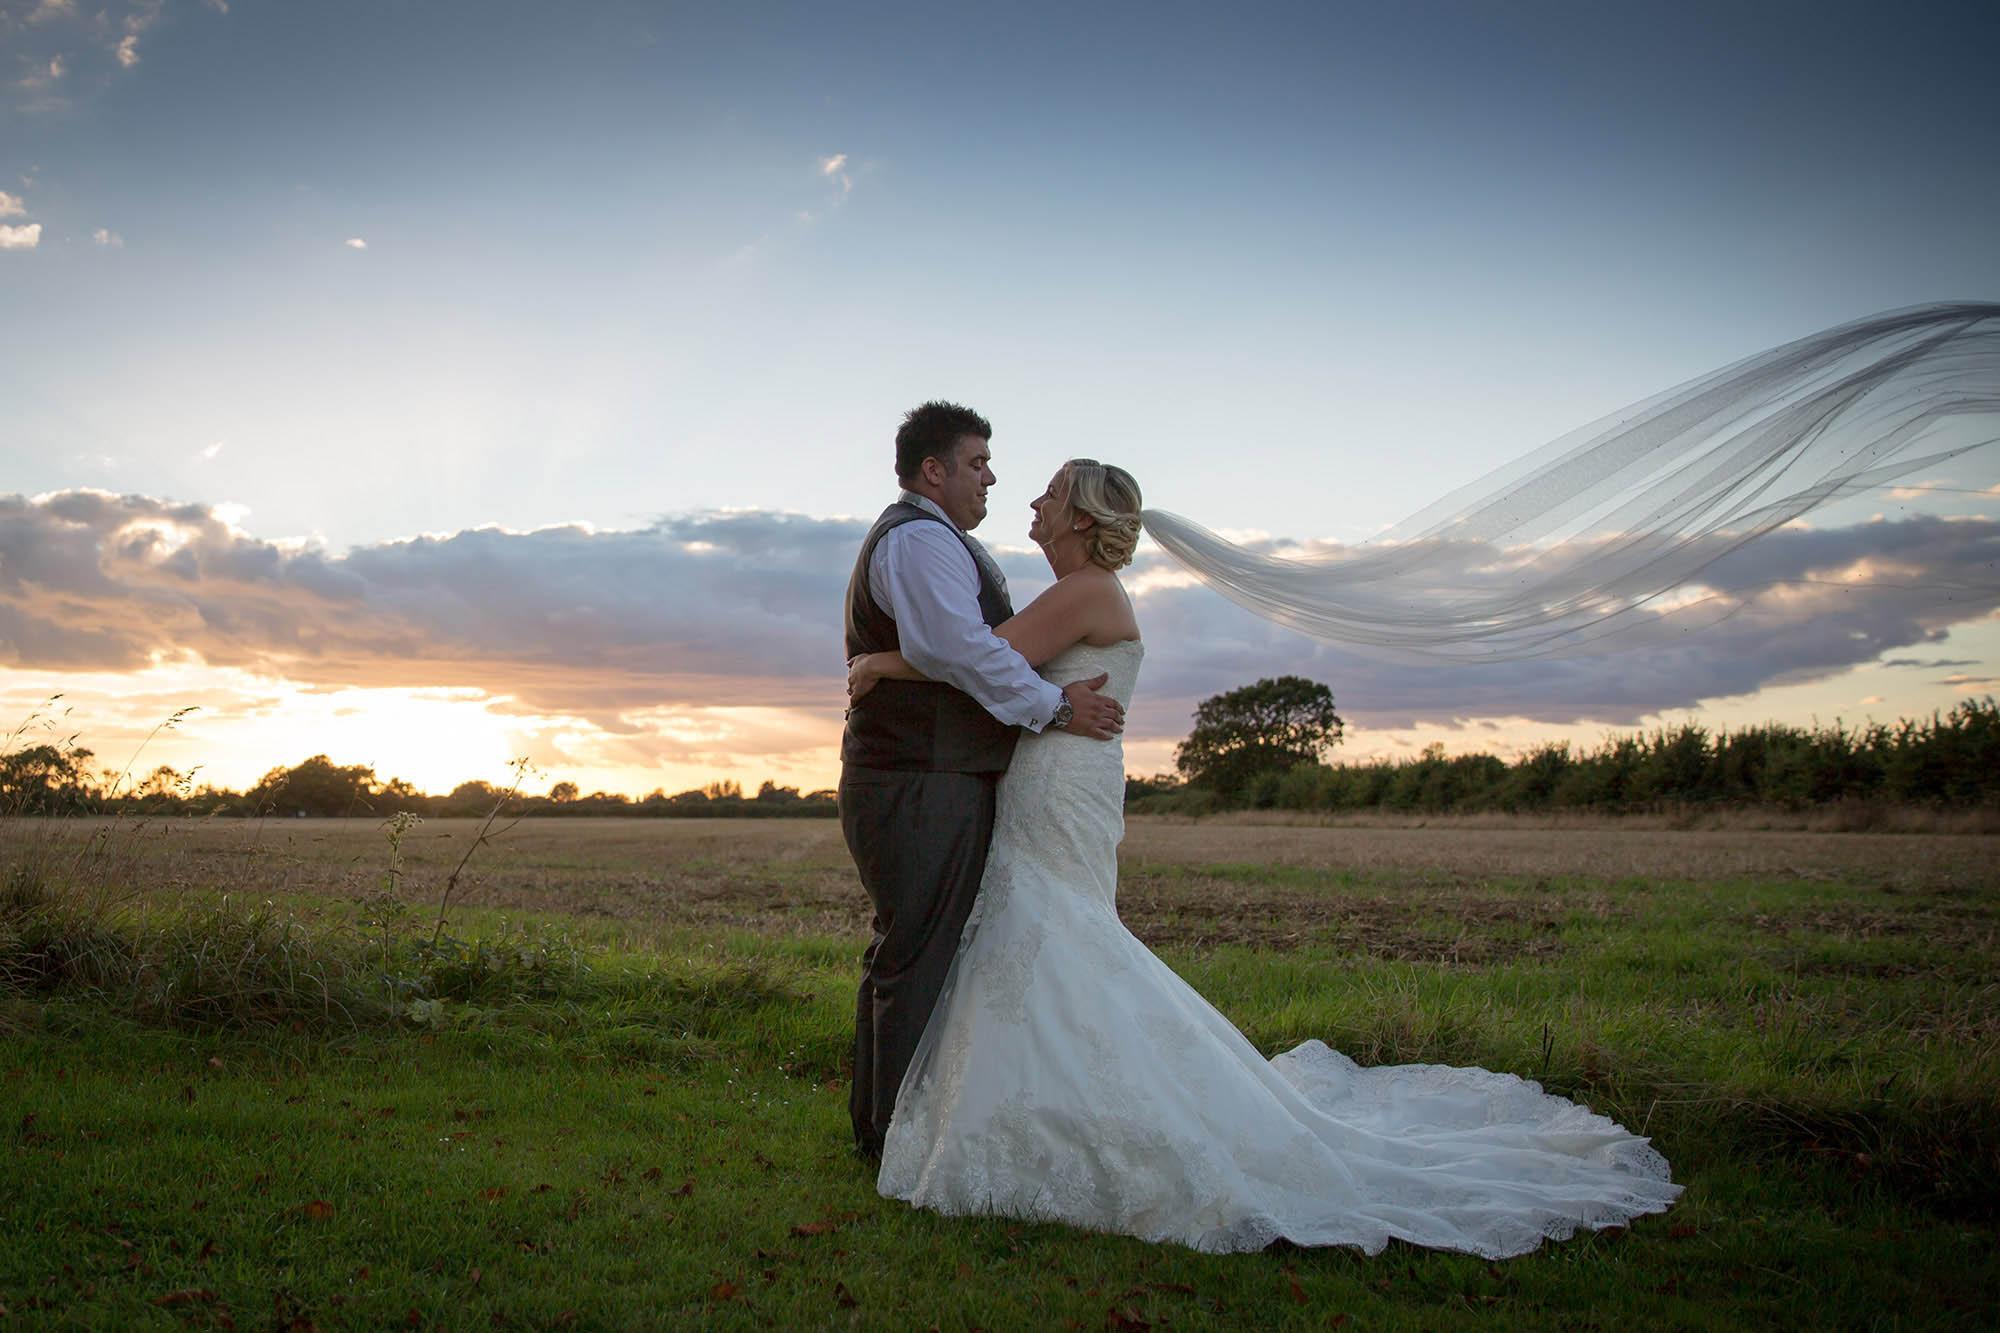 julia-toms-wedding-photographer-west-sussex-007.jpg